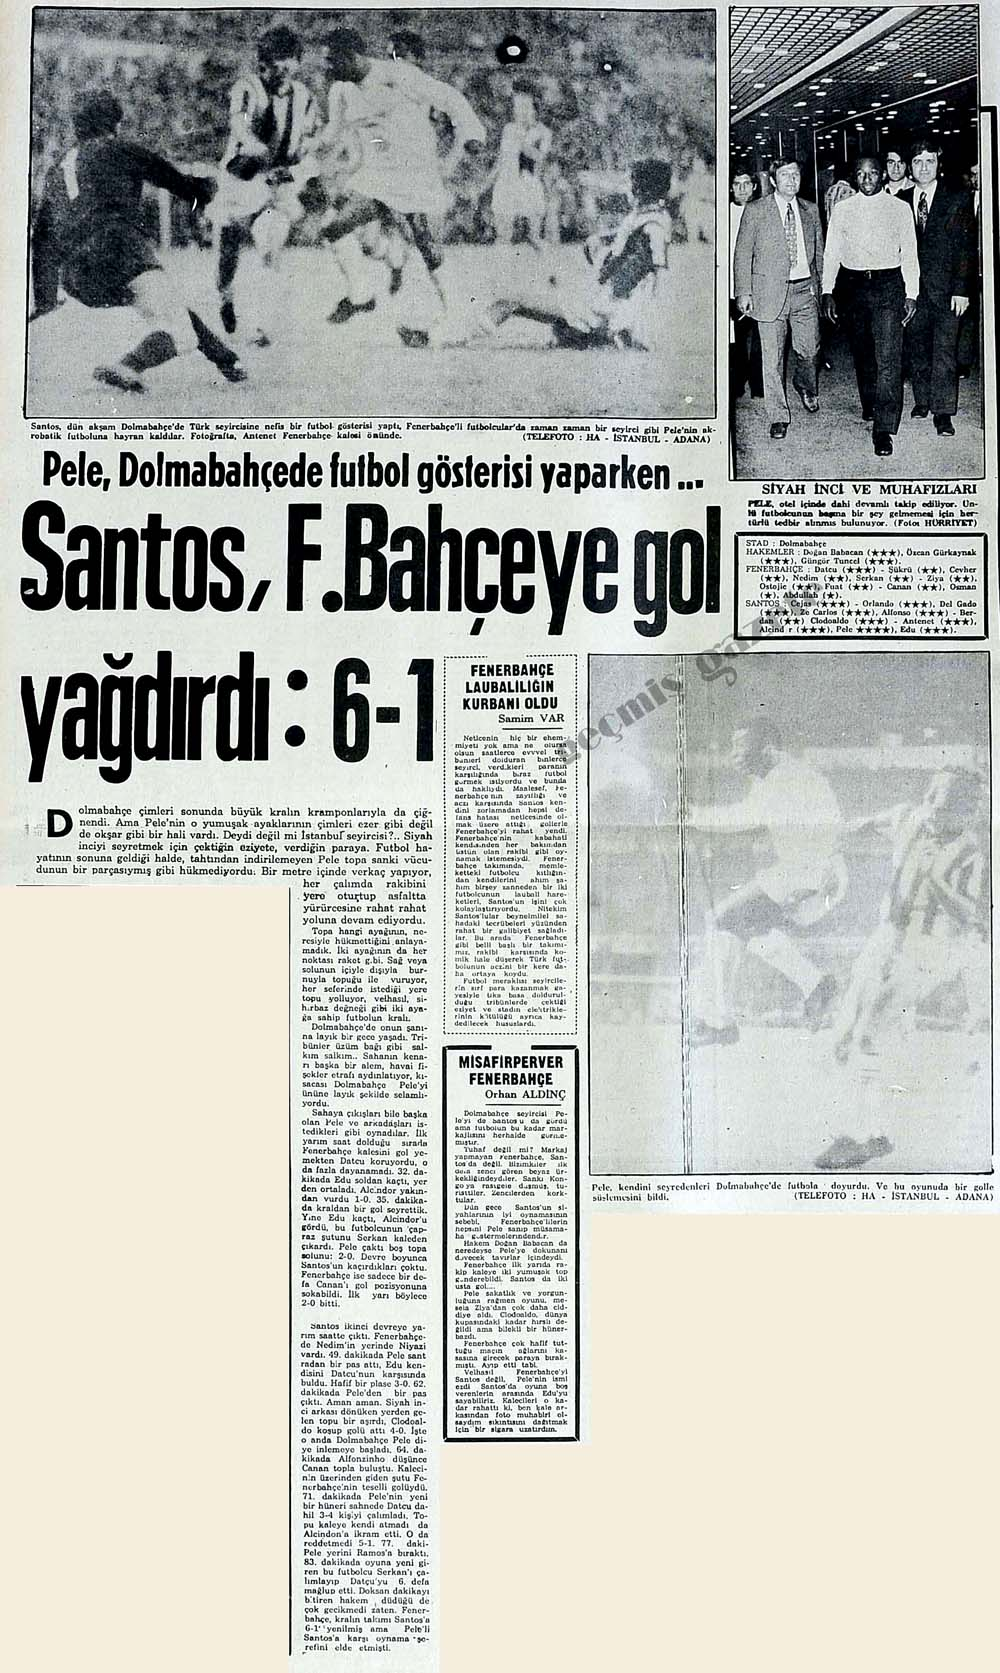 Pele, Dolmabahçede futbol gösterisi yaparken...